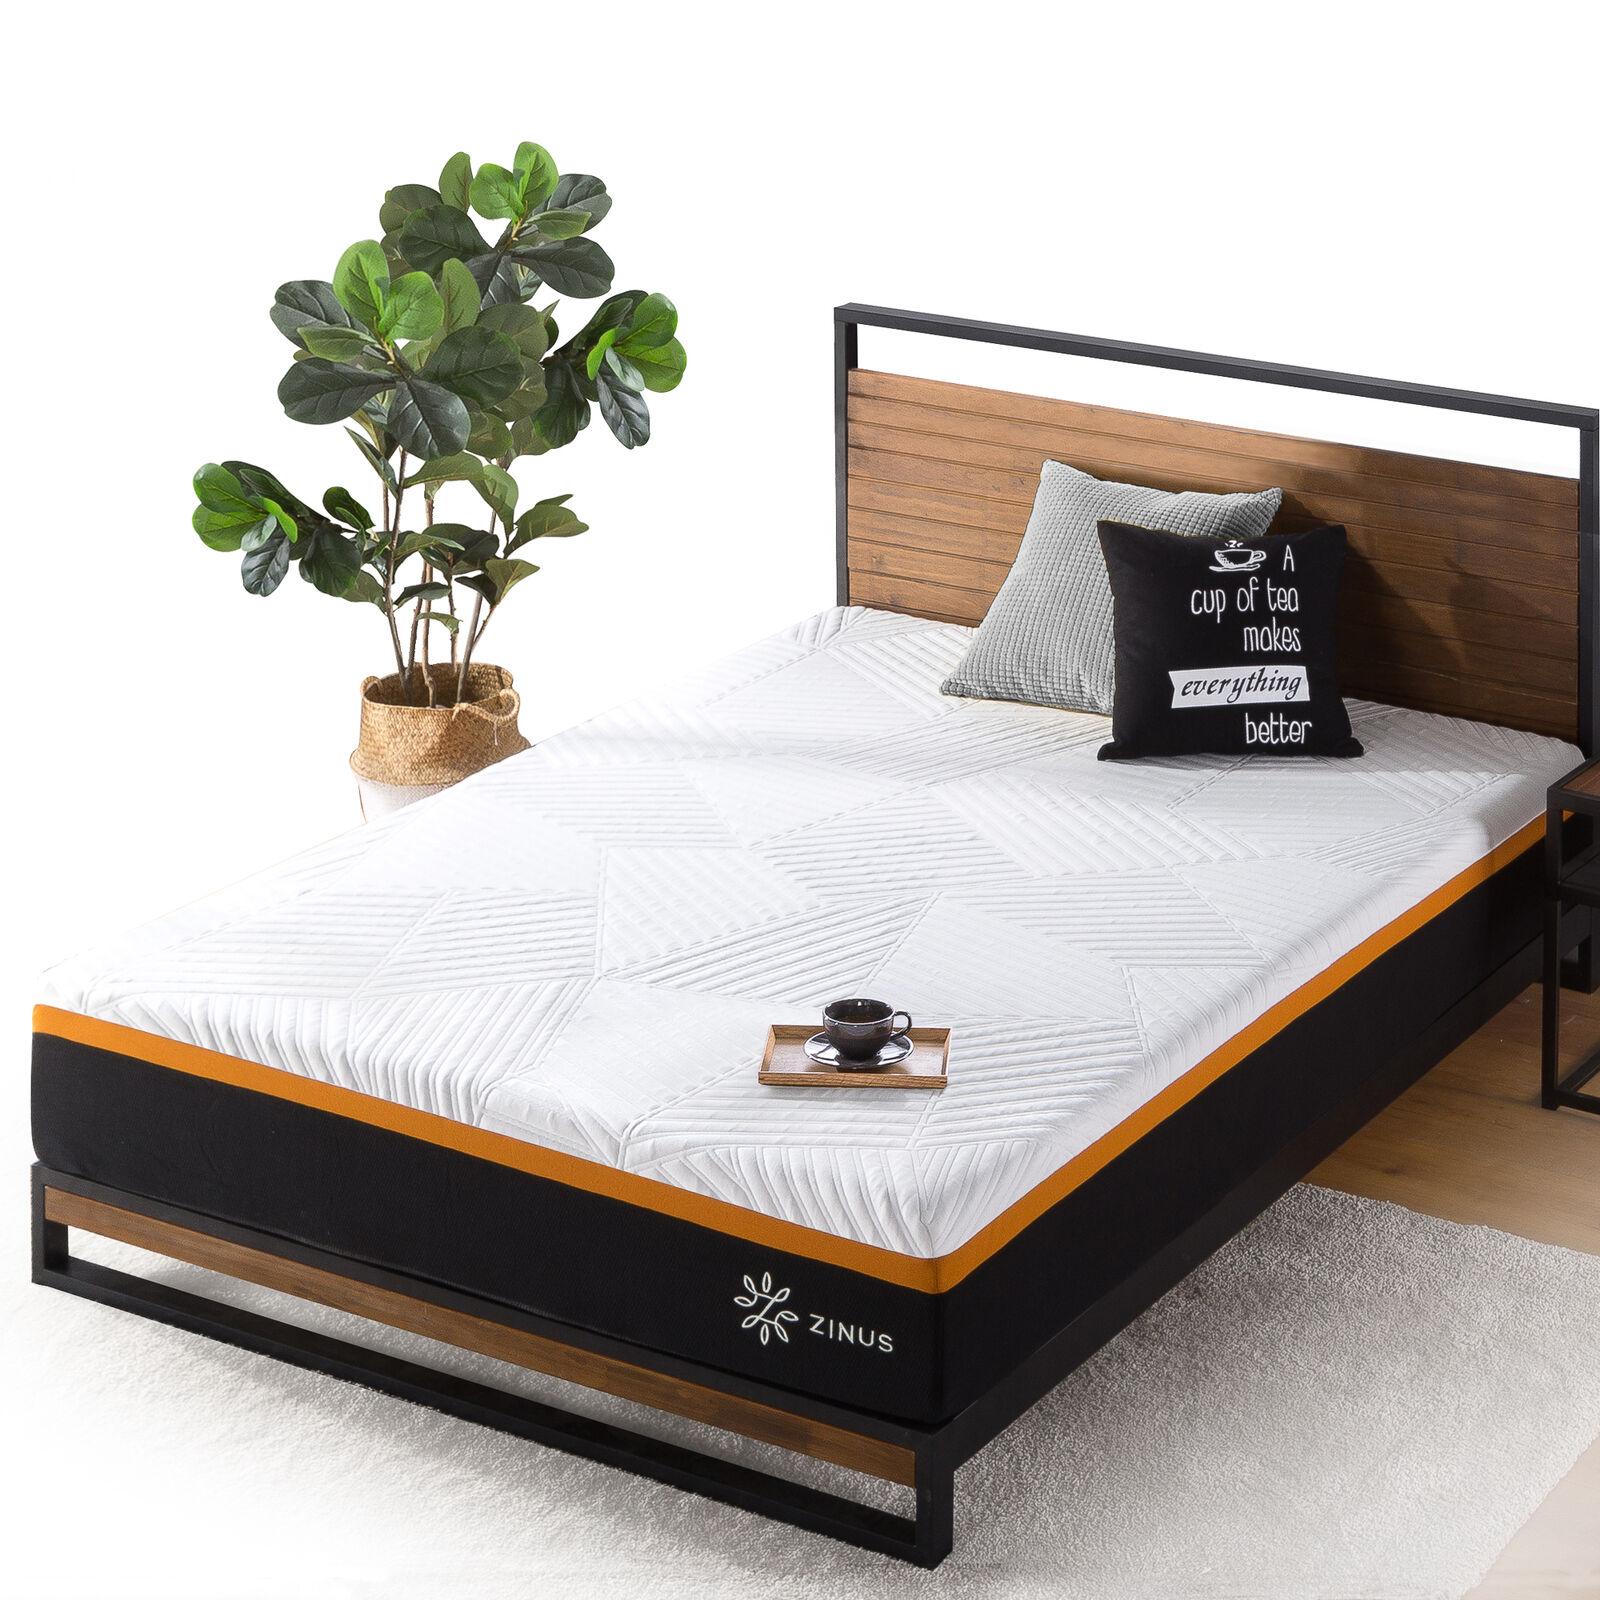 thumbnail 100 - Zinus Mattress Queen Double King Single Bed Memory Foam Pocket Spring Hybrid